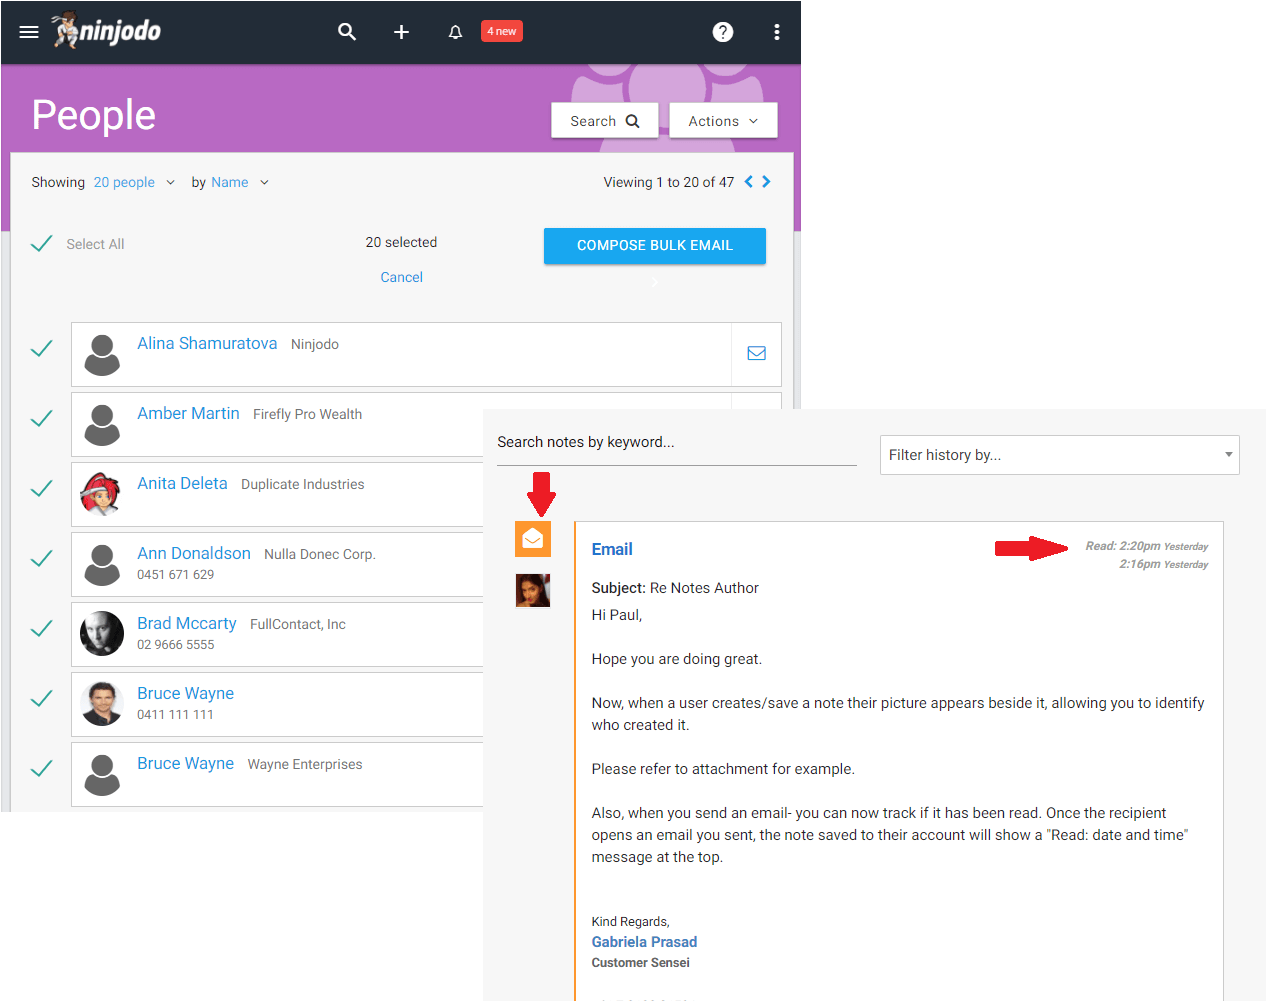 Ninjodo Bulk Emailing and Open Tracking